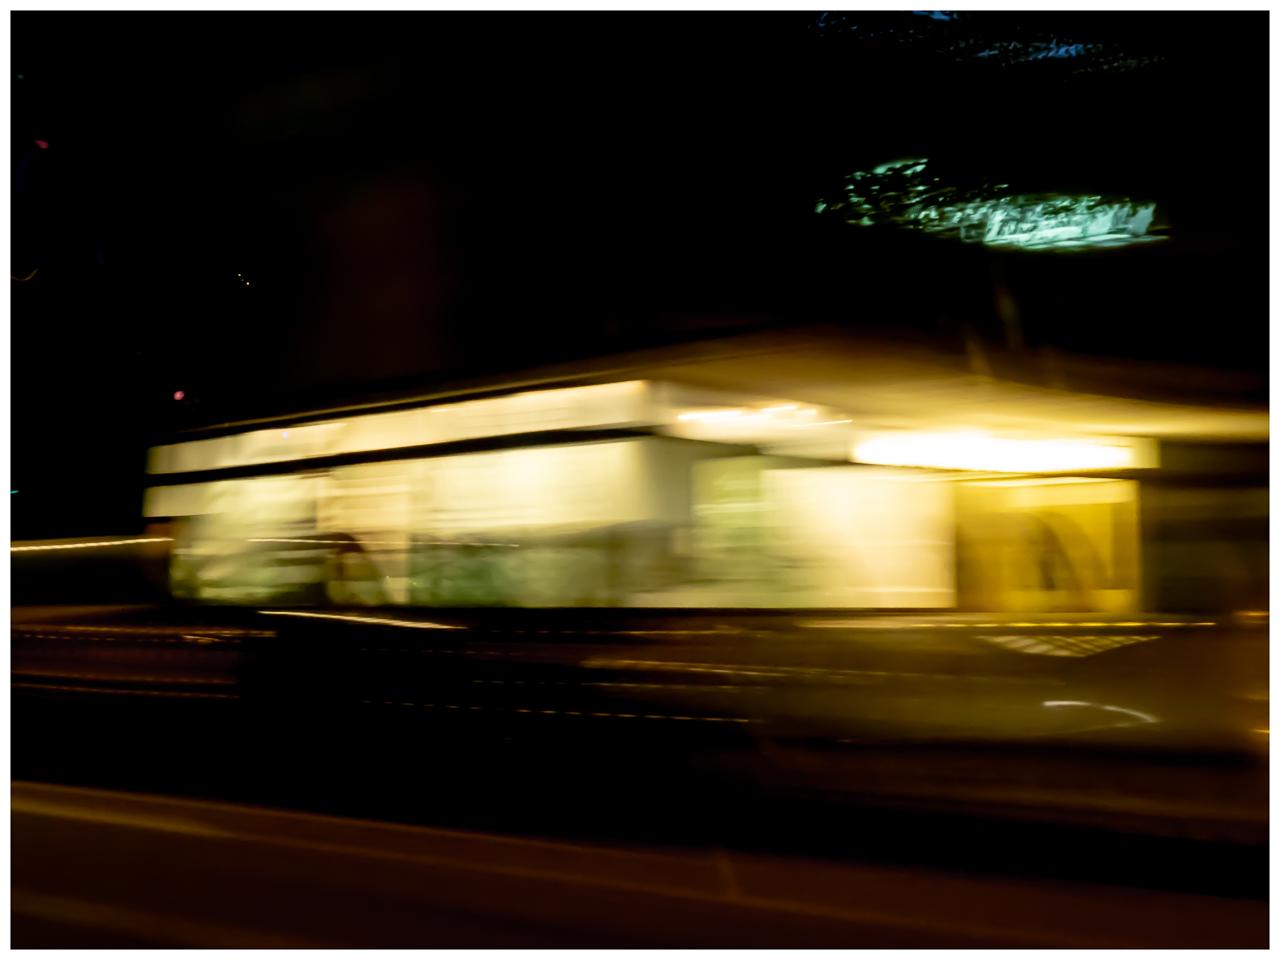 Archivum Secretum III: Night Rider, Berlin-Tempelhof 2018